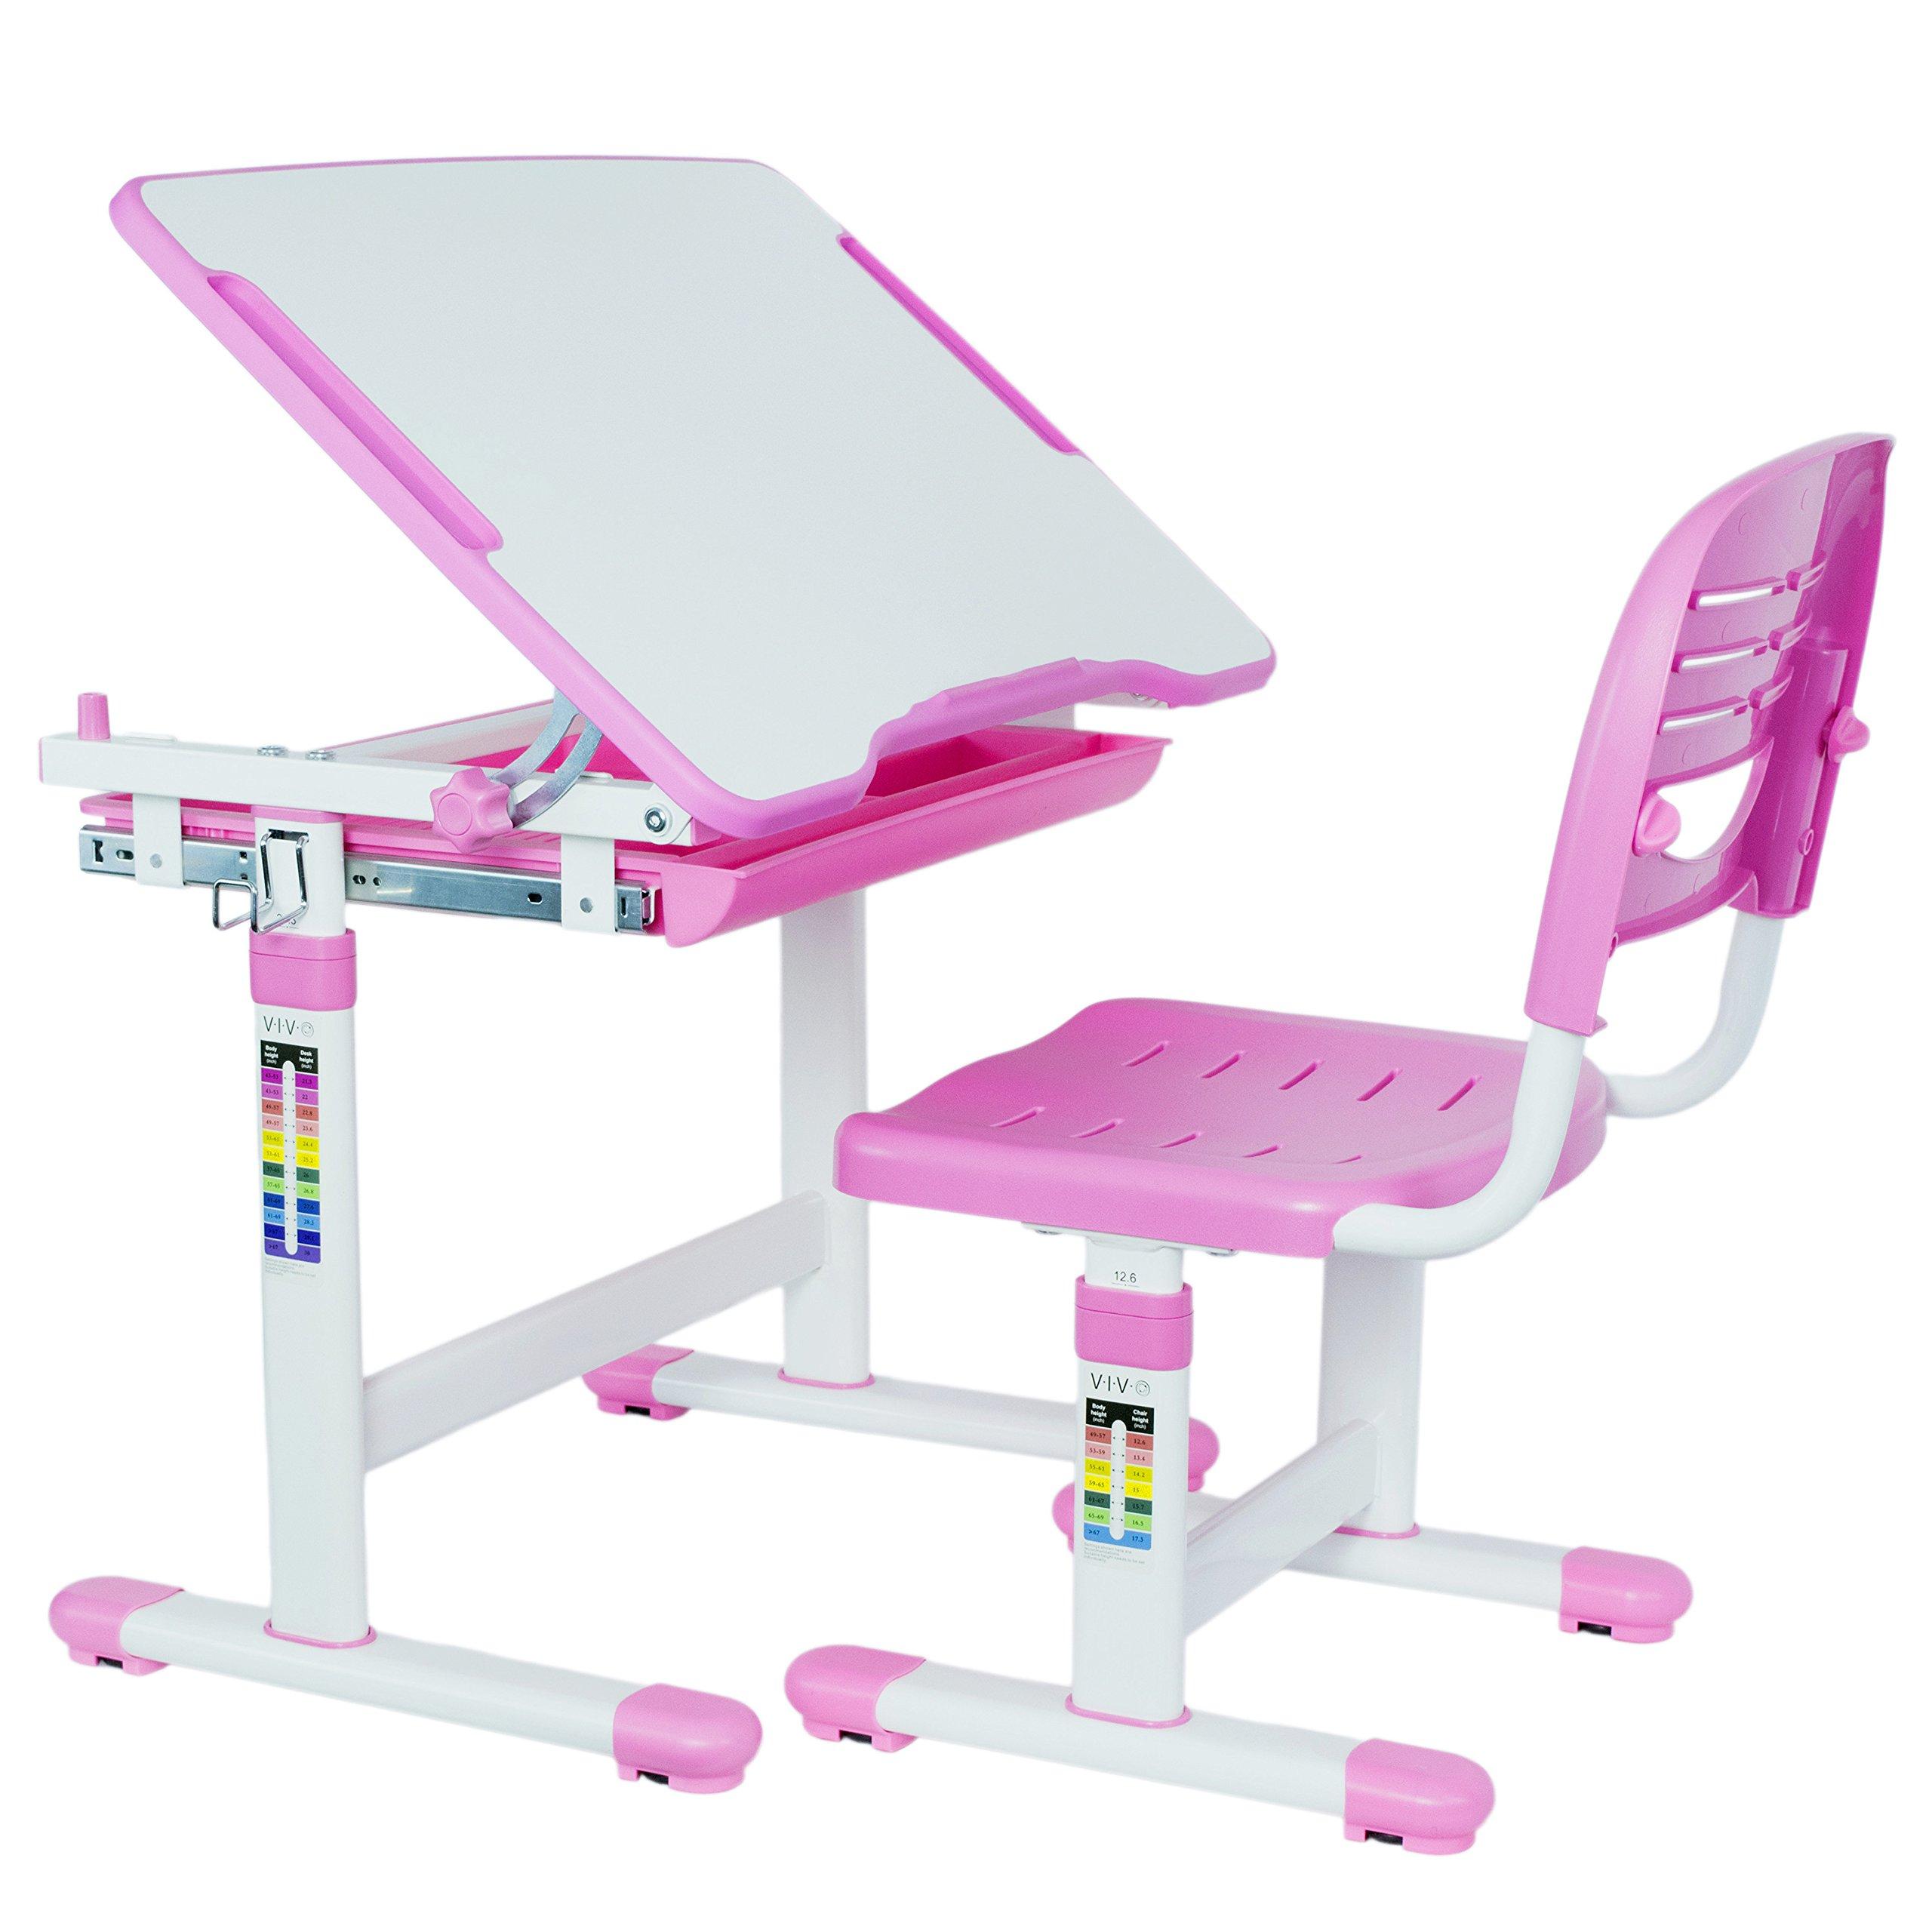 Fabulous Cheap Kids Desk Chair Ikea Find Kids Desk Chair Ikea Deals Creativecarmelina Interior Chair Design Creativecarmelinacom